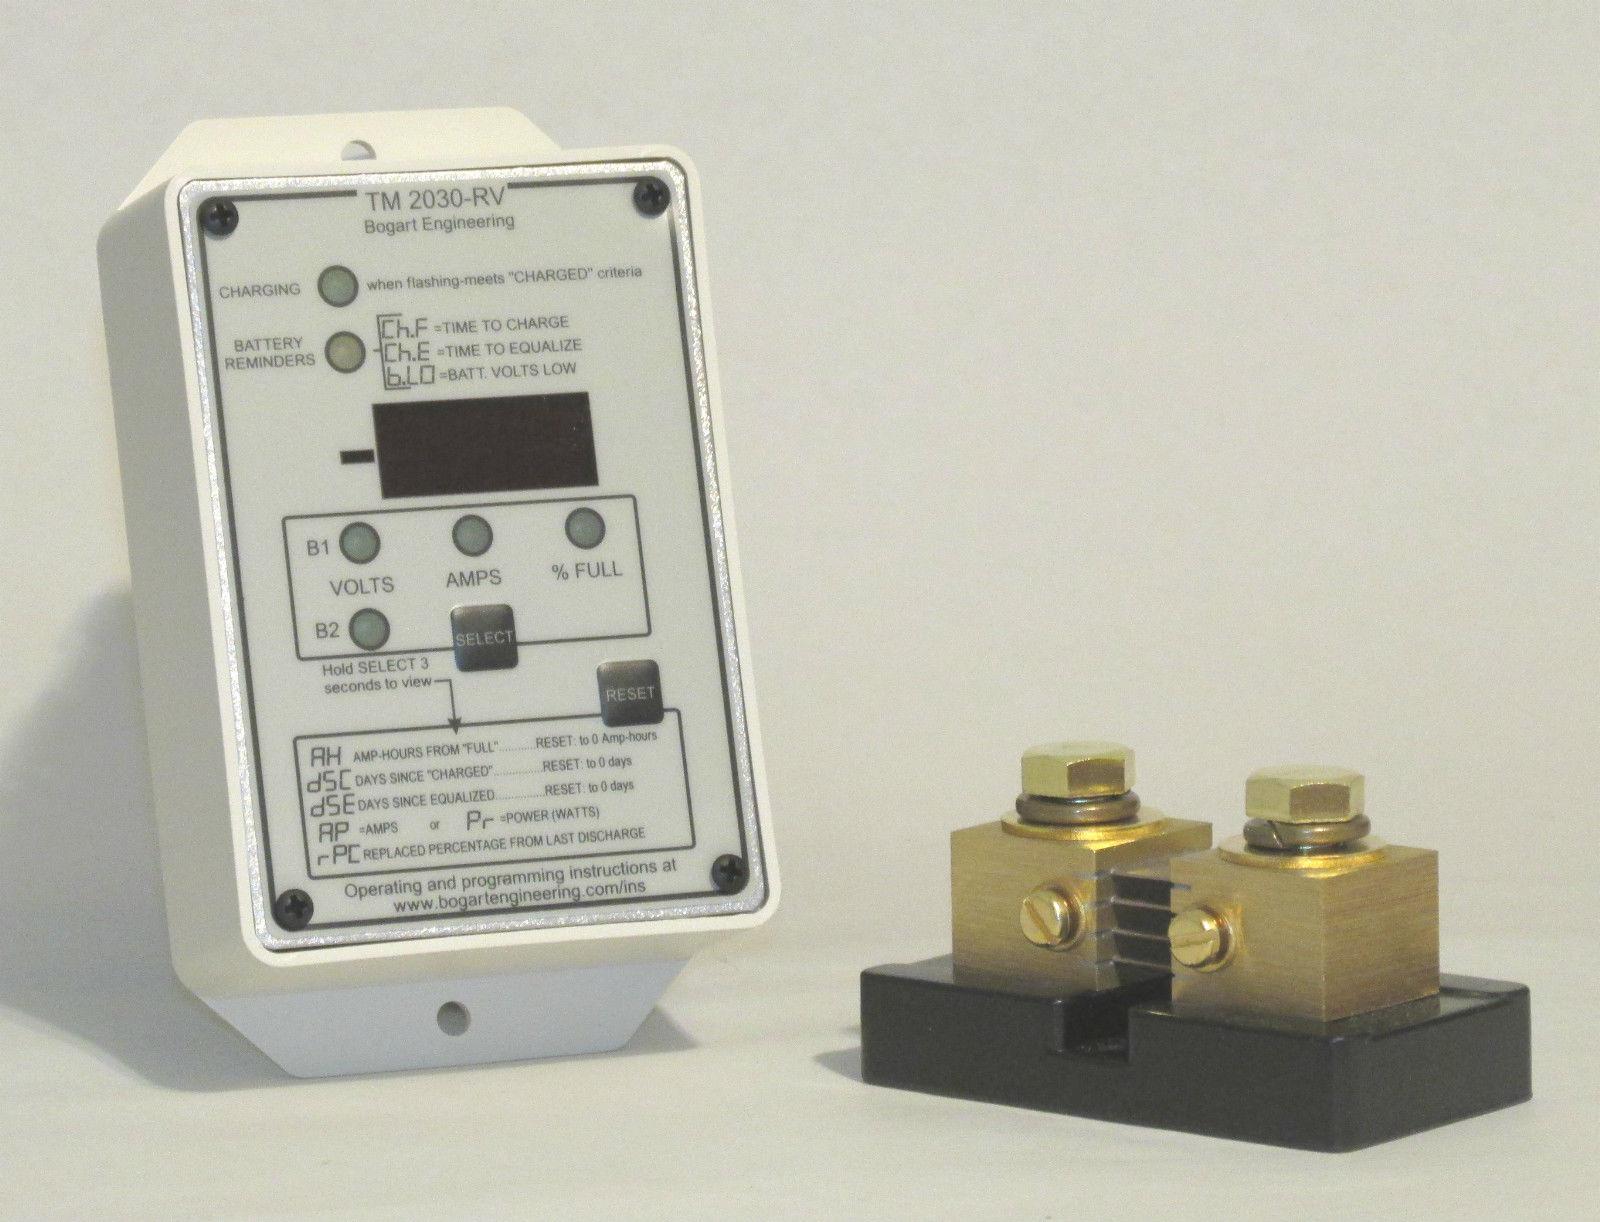 Cable 100AMP Shunt Bogart TriMetric 2030-A Solar Battery Monitor Meter Fuse